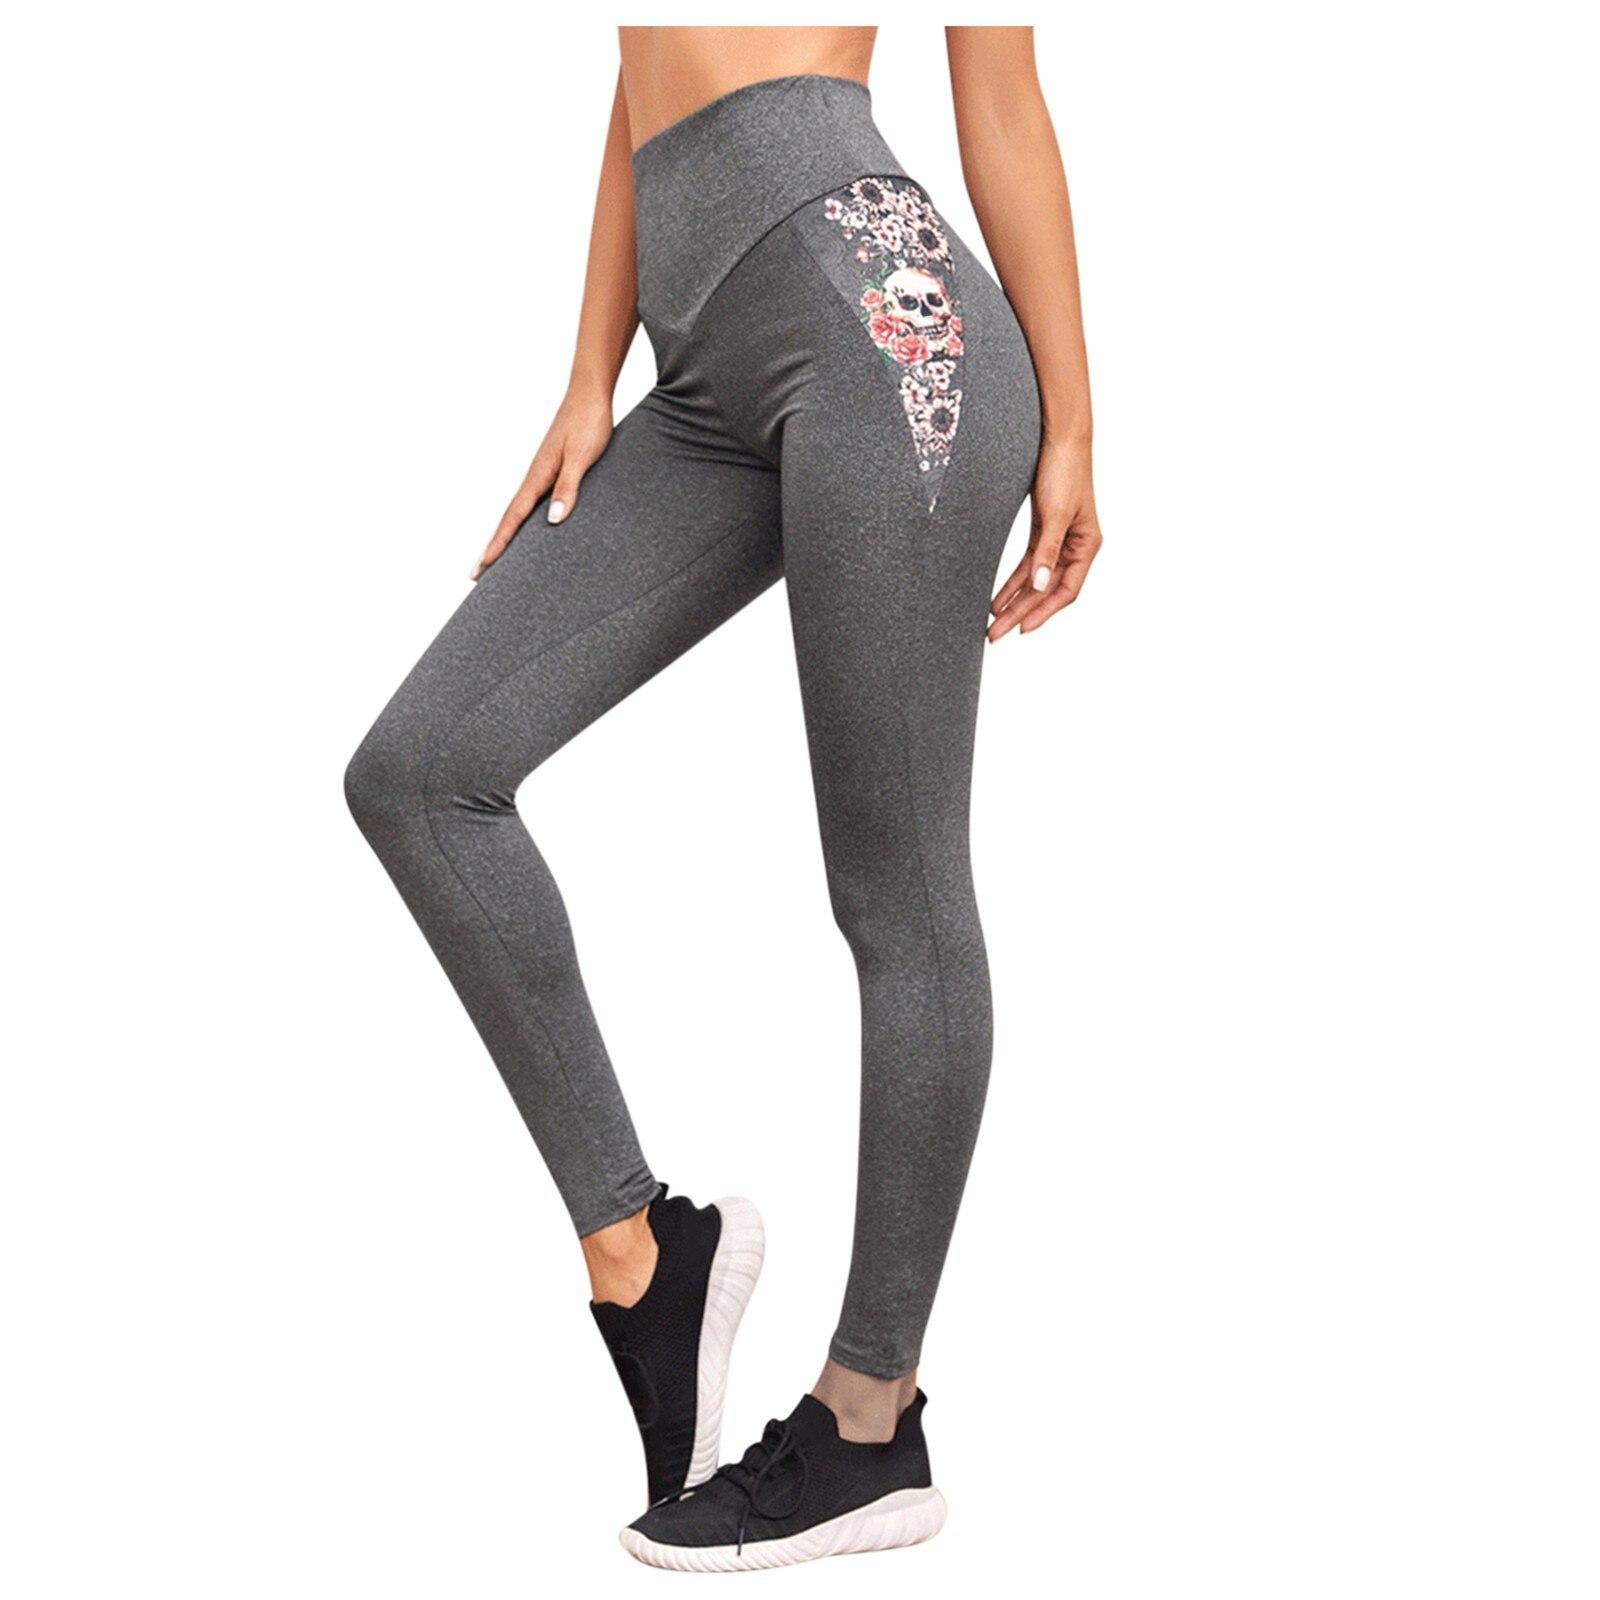 Women's Seamless Fitness Leggings Female High Waist Running Sports Leggings Sportswear Gym Yoga Sport Pants Clothing FFT